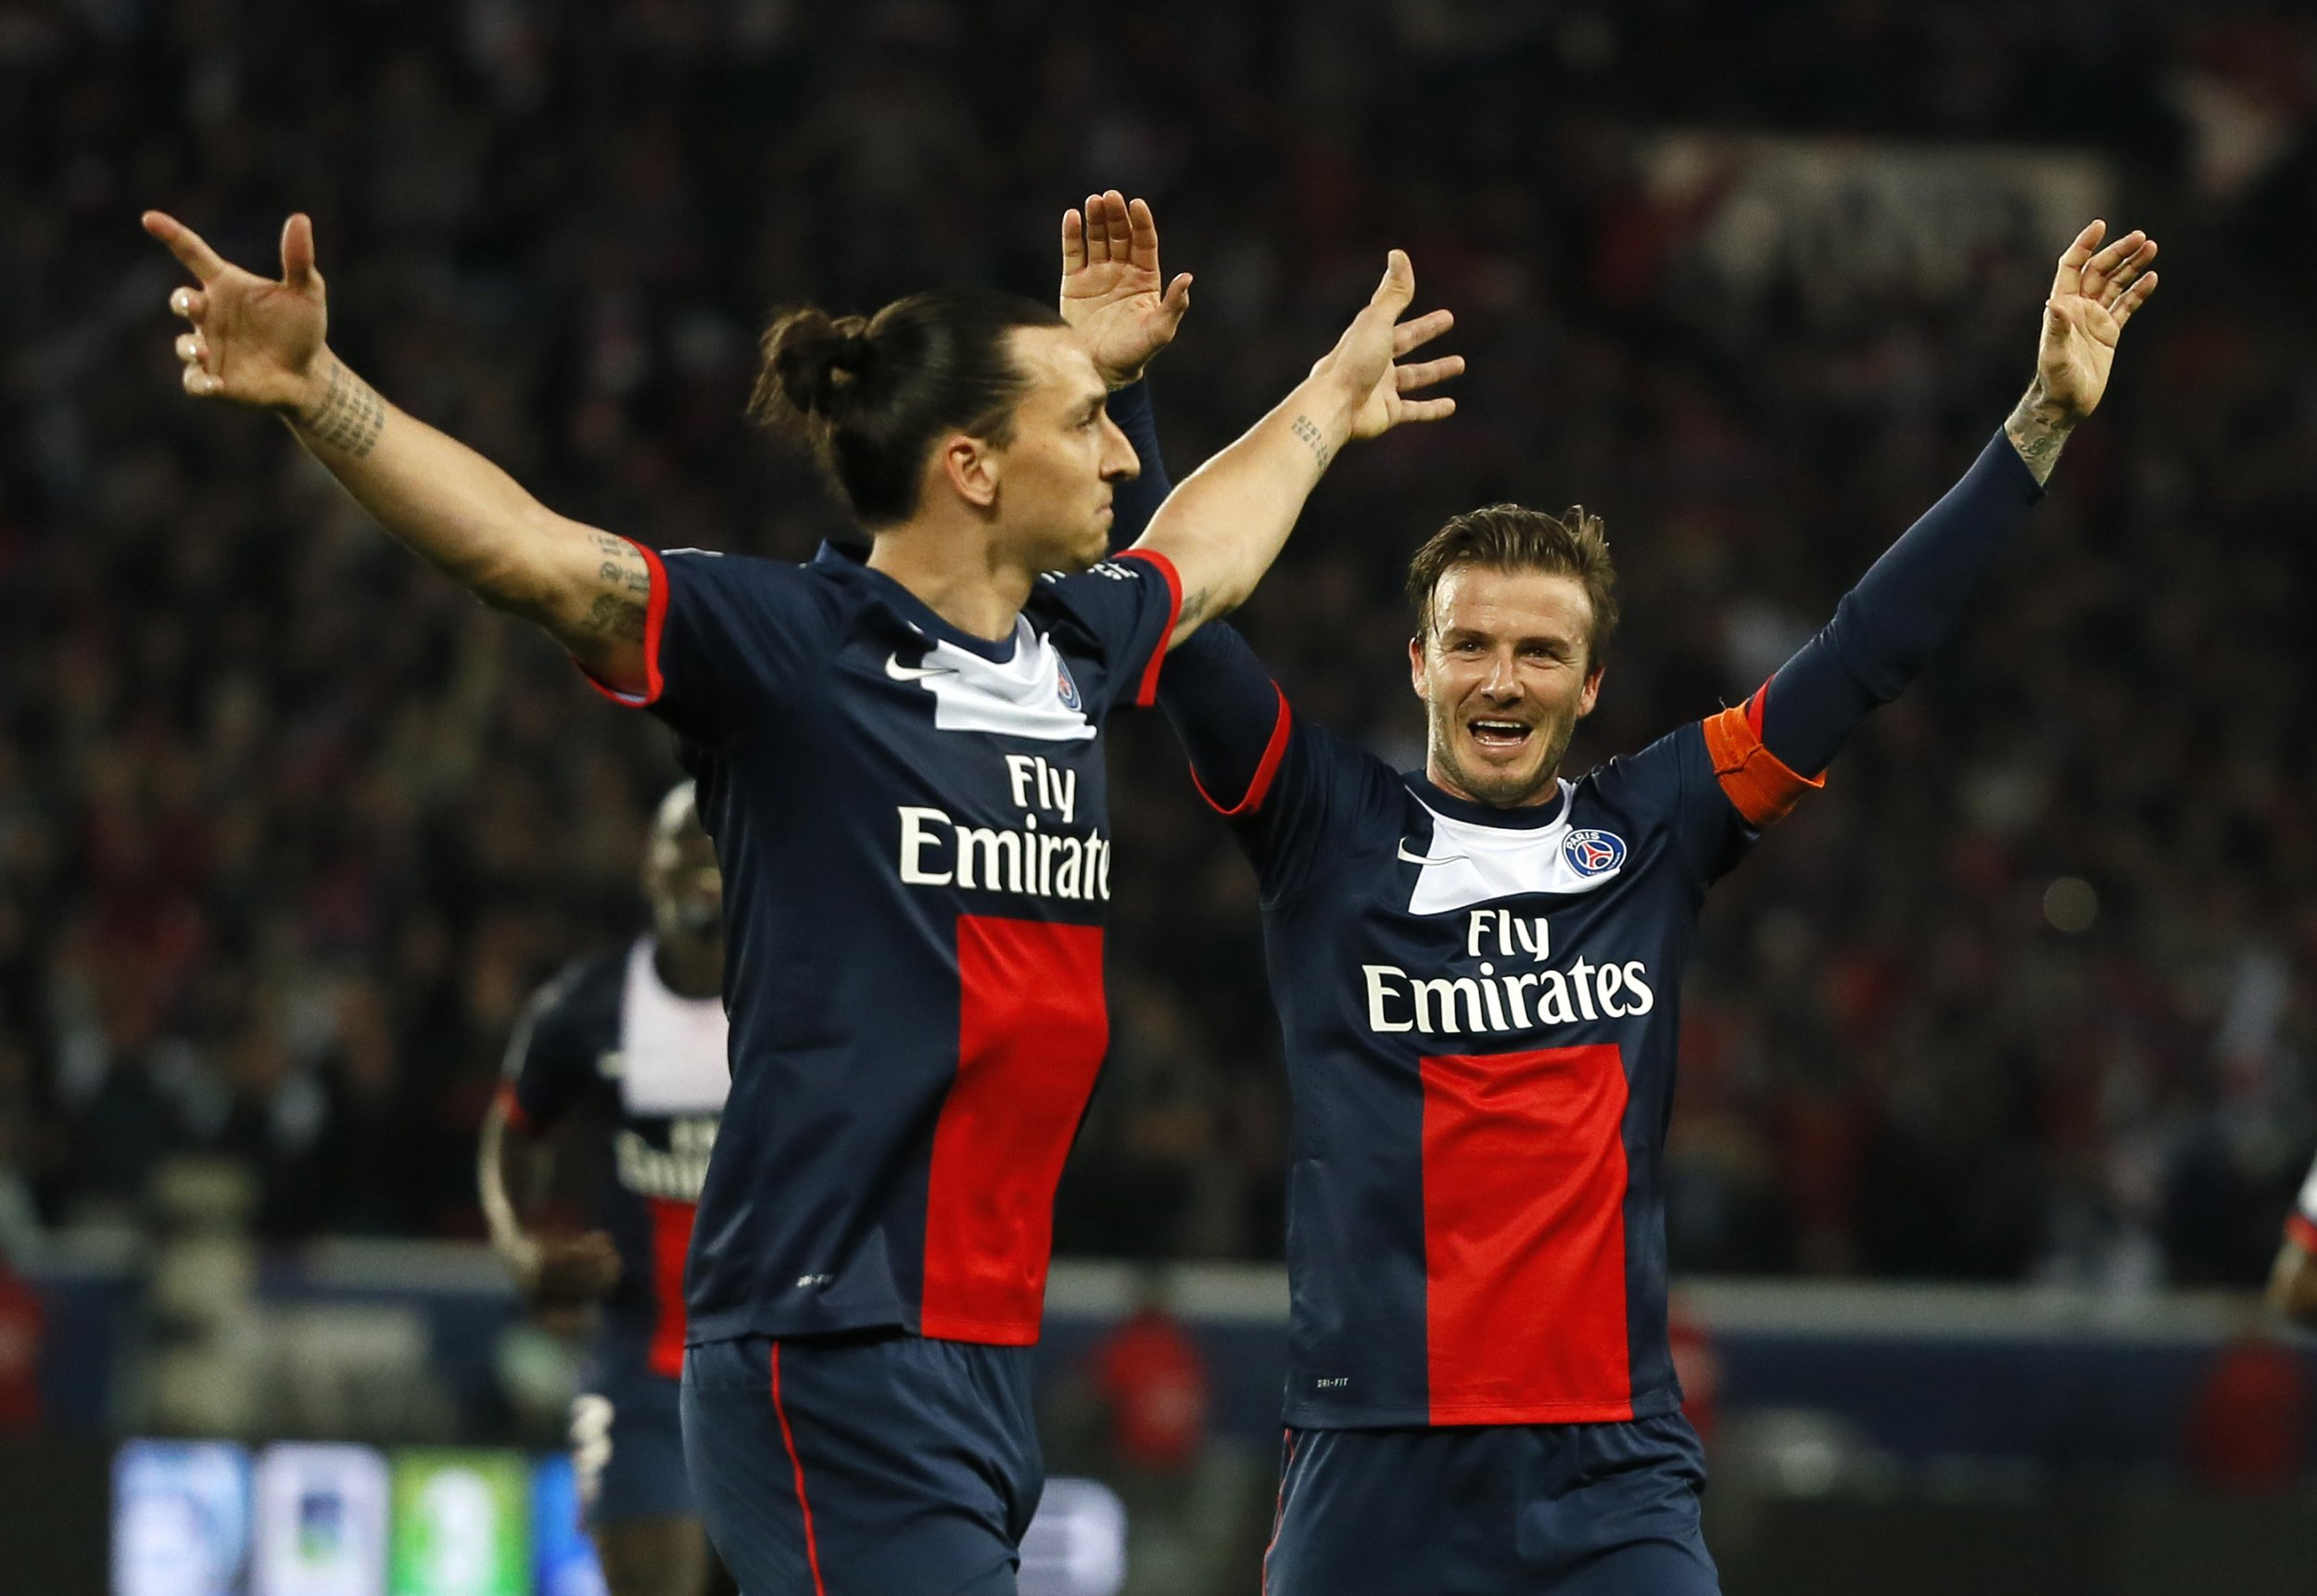 Zlatan Ibrahimovic and David Beckham